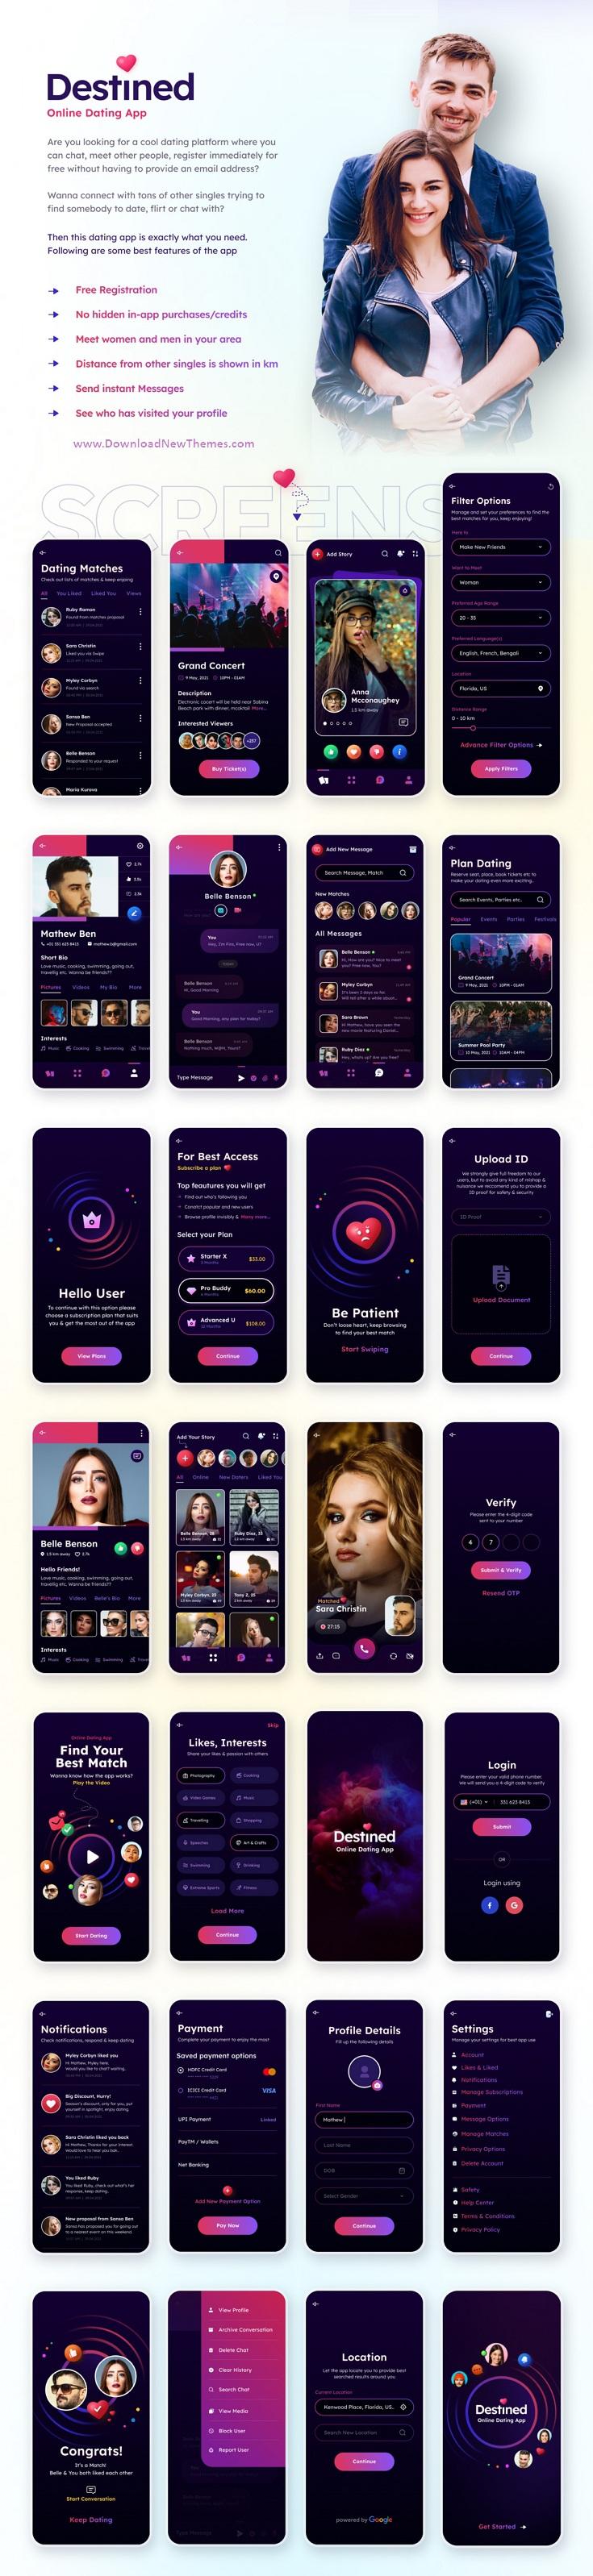 Dating App UI Figma Template